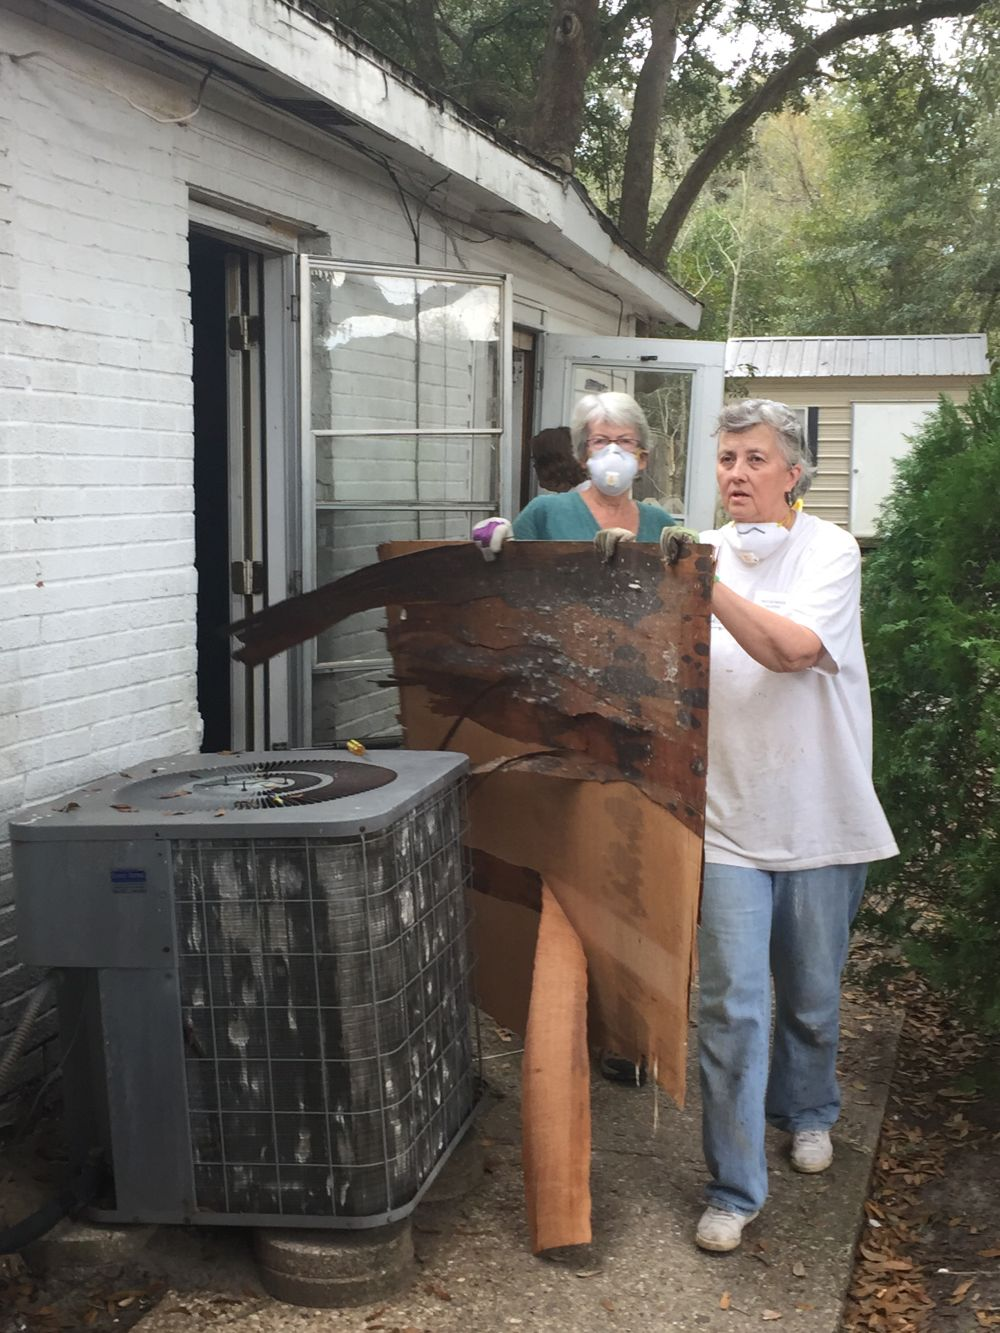 M - Debris removal work site 1